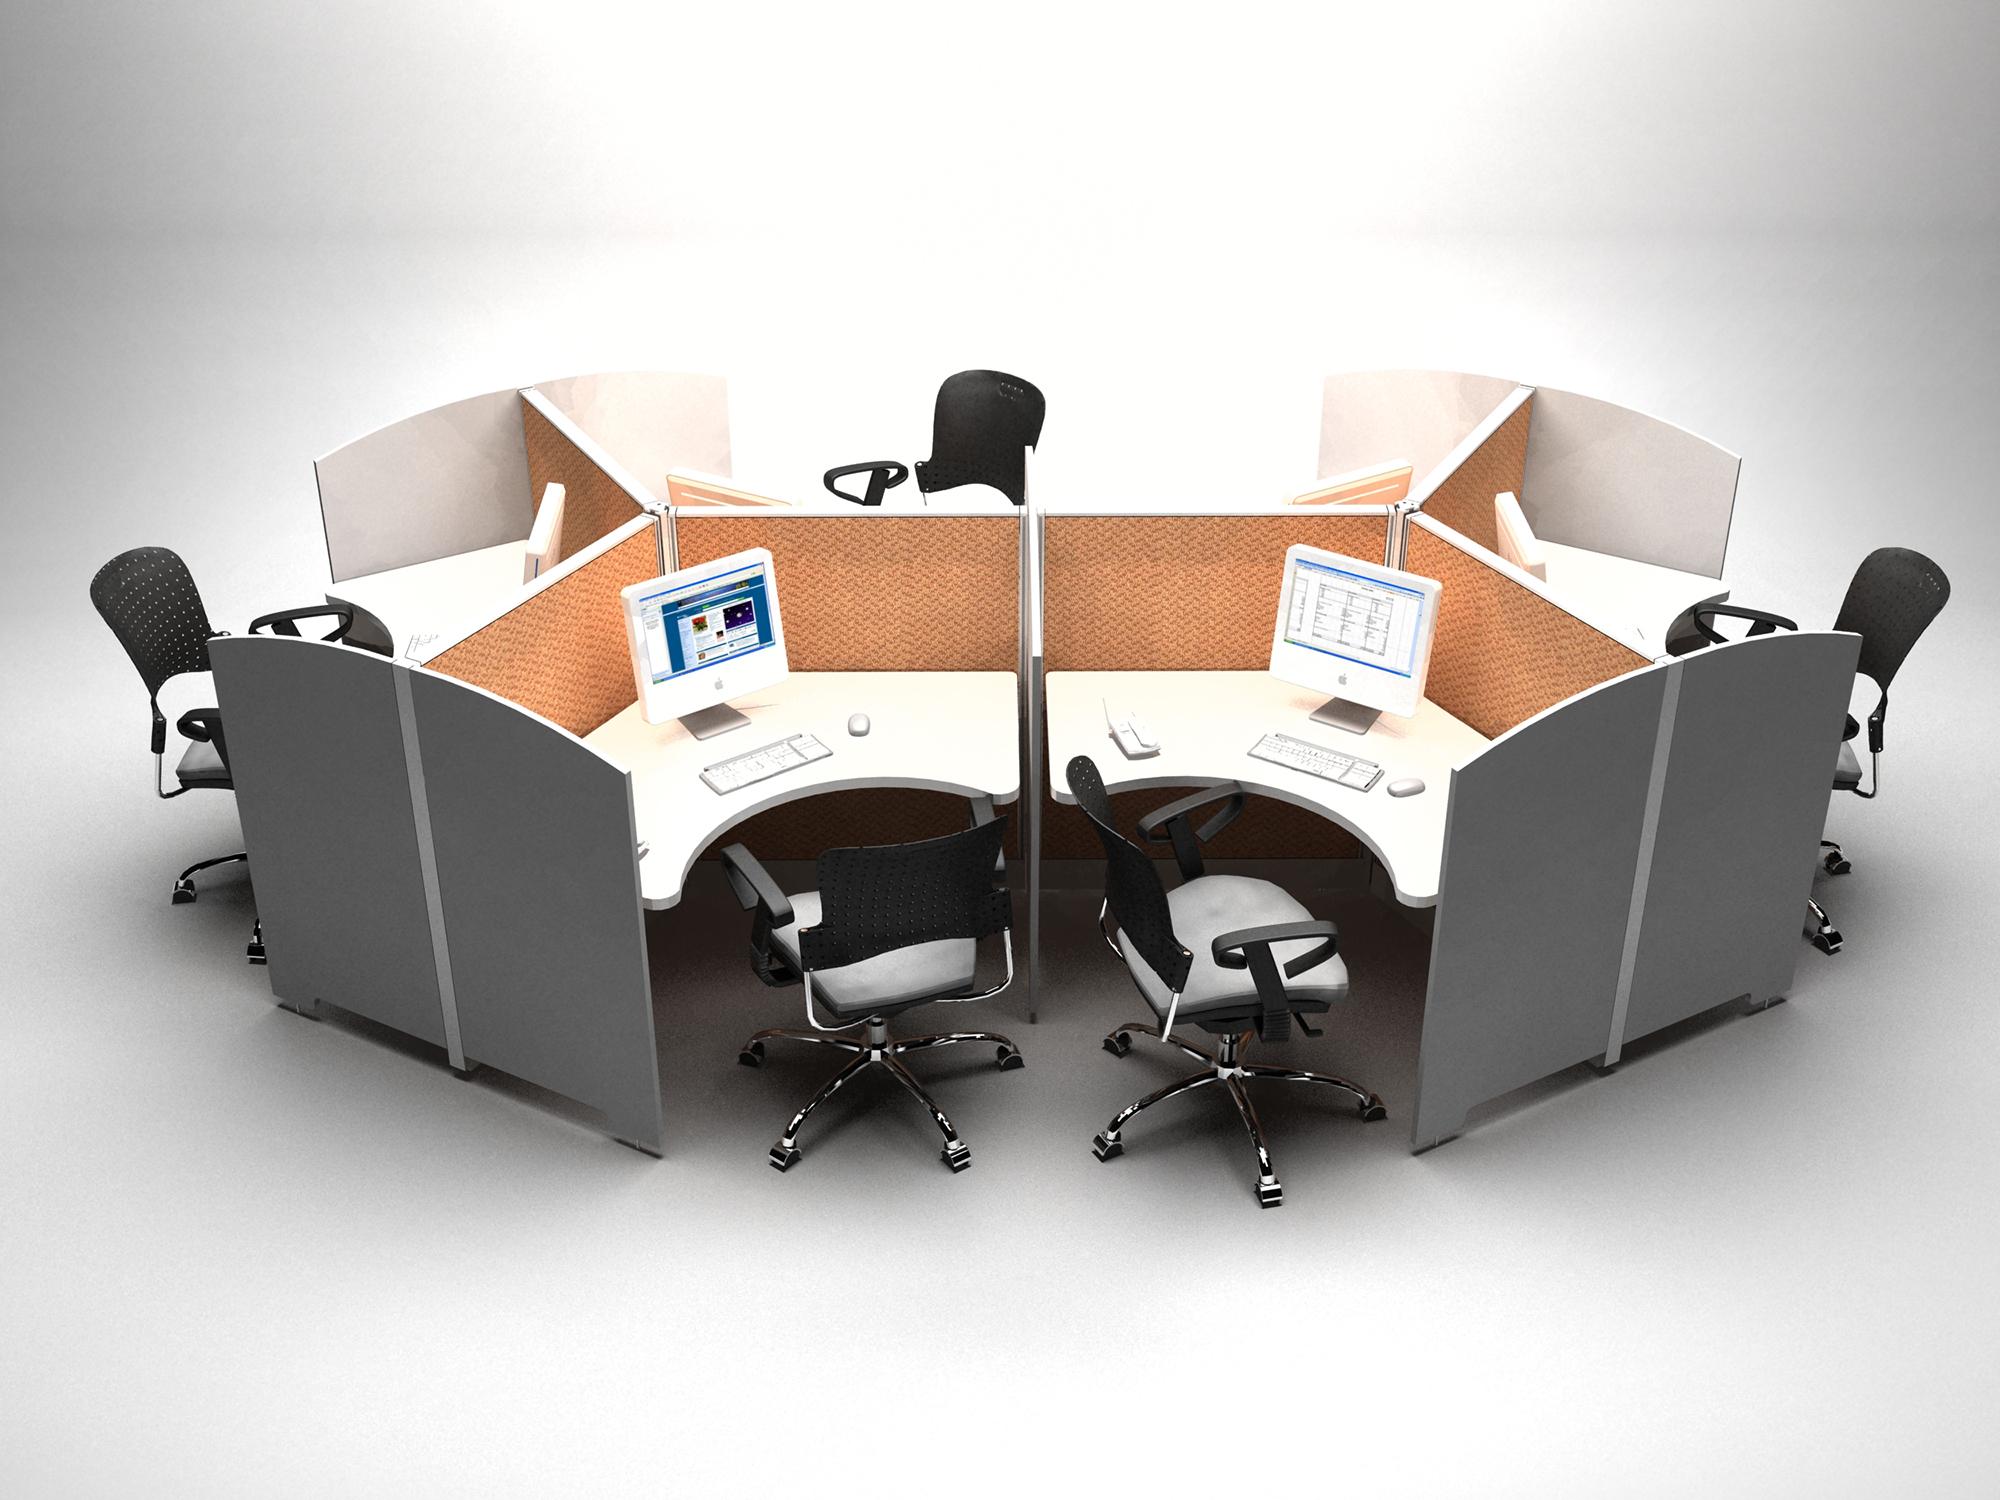 Capacitaci n bim arkasis for Proveedores de muebles para oficina